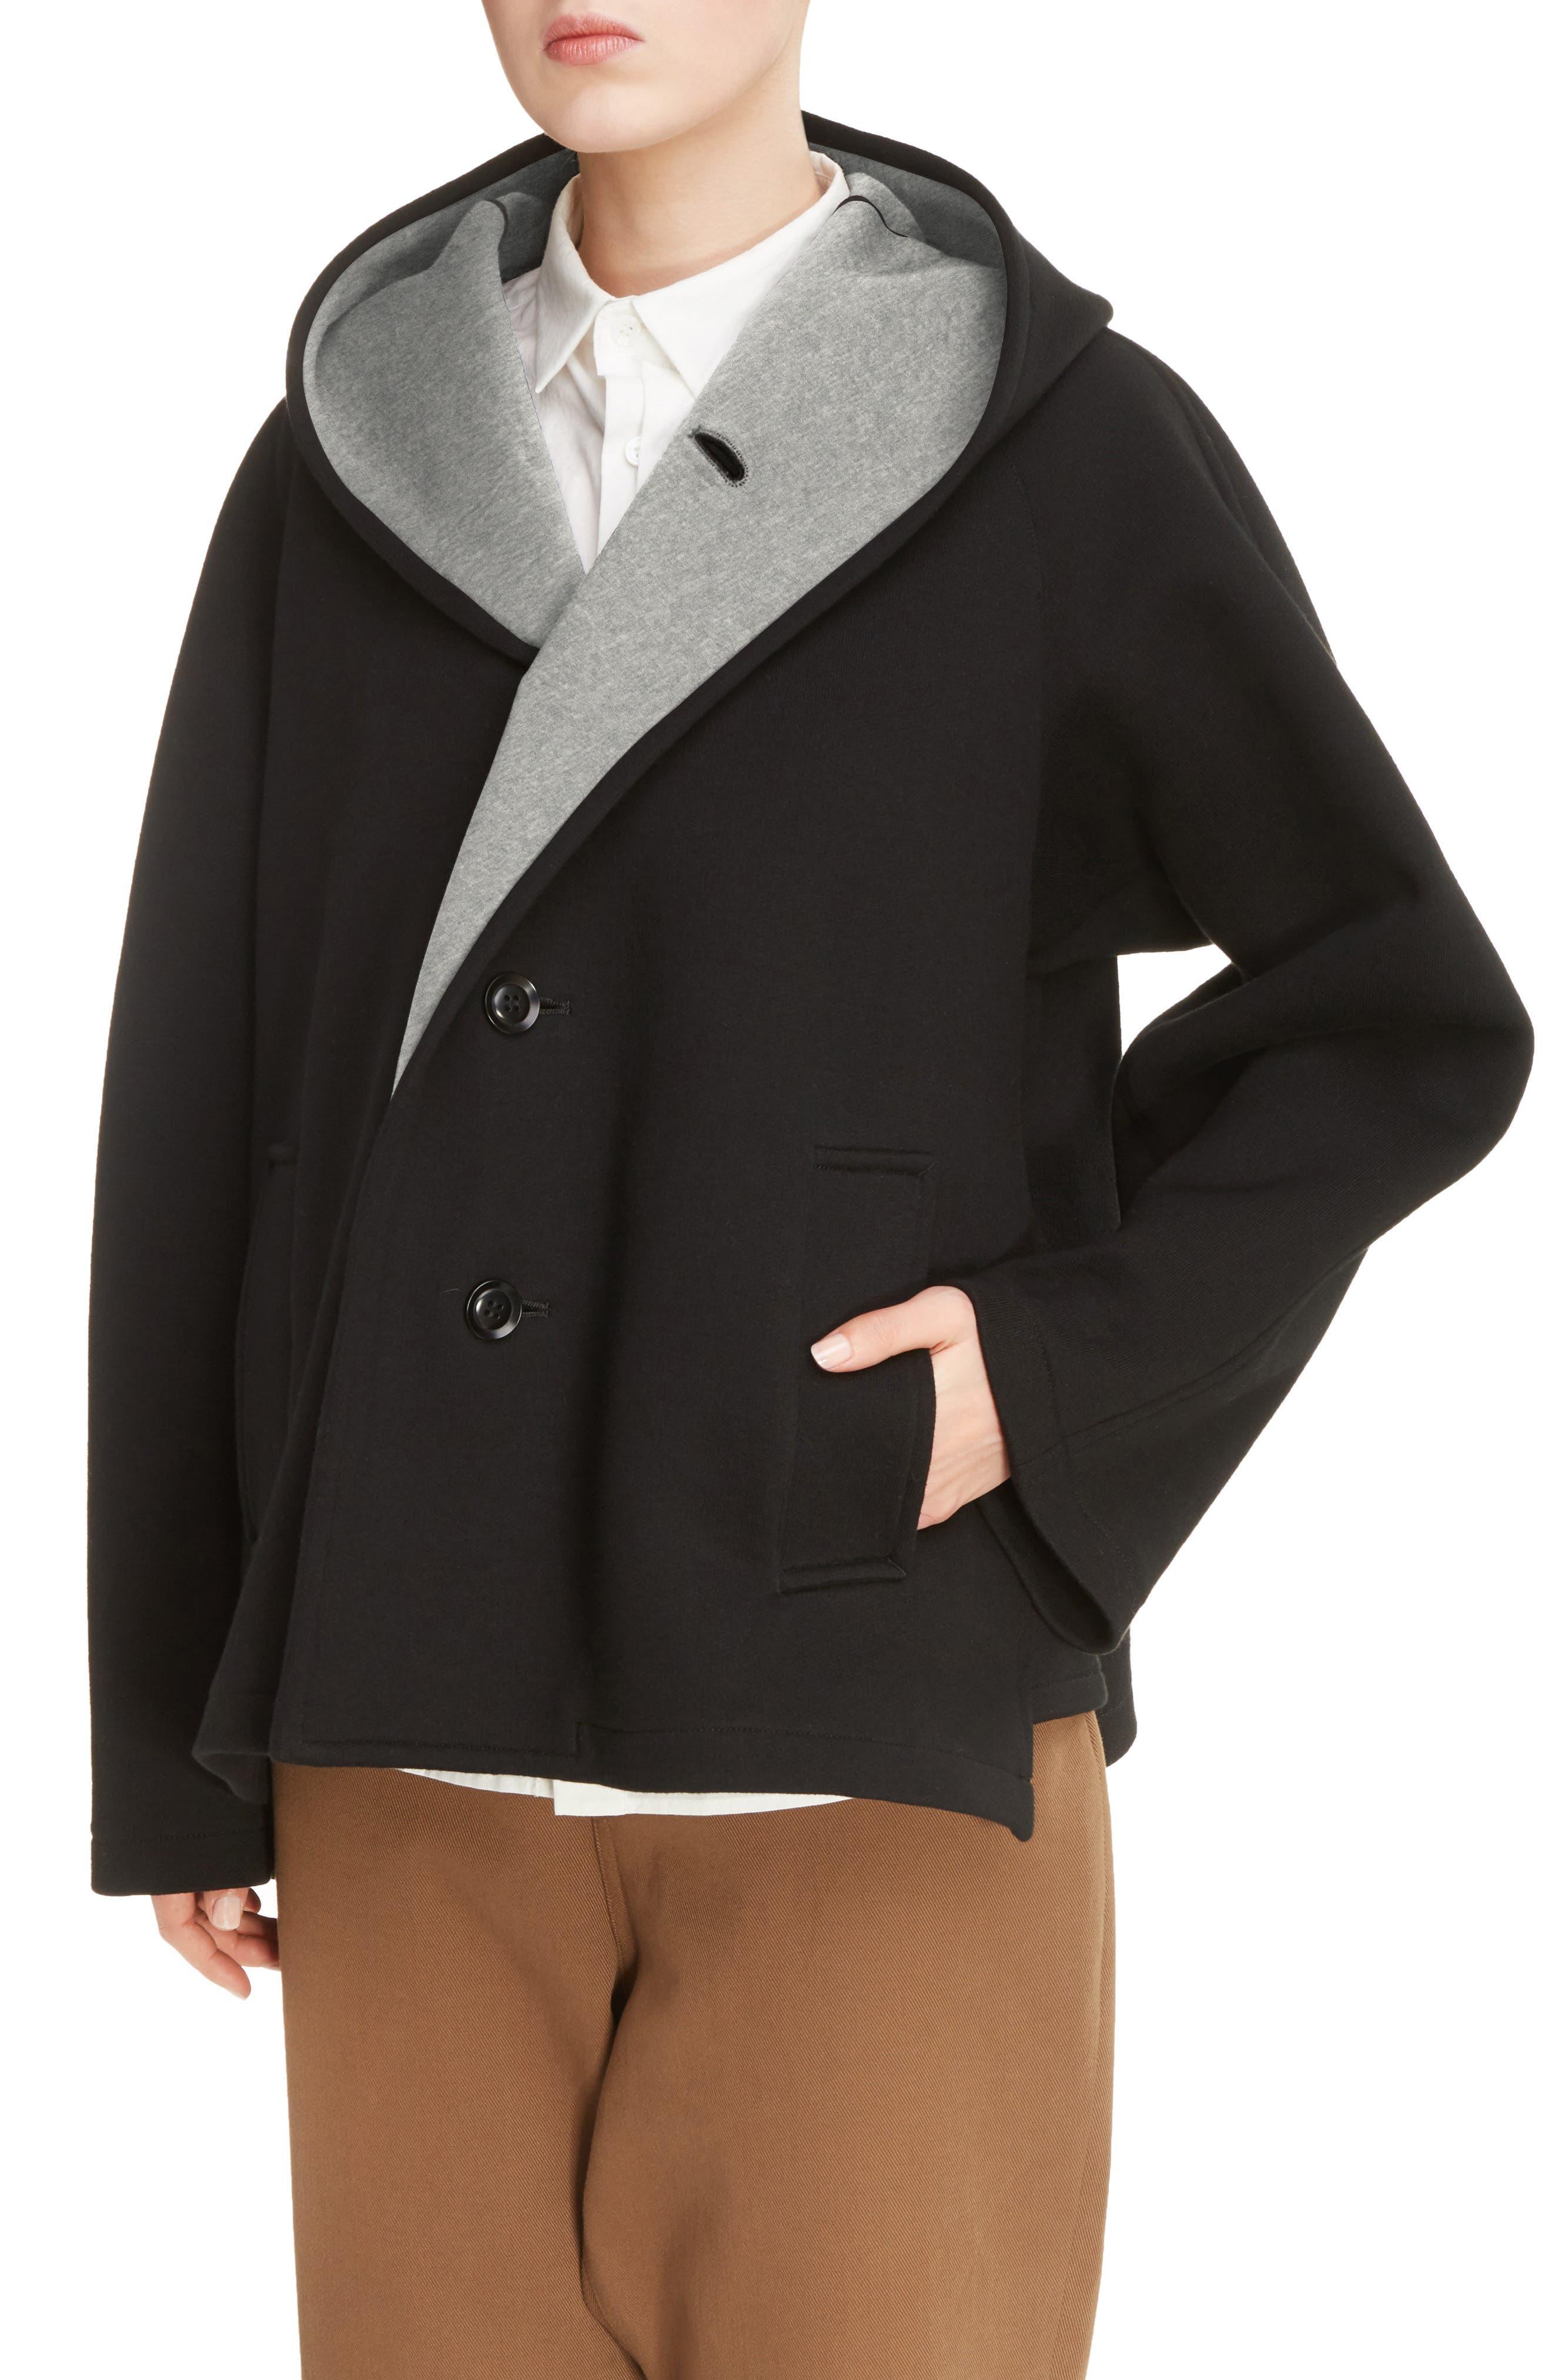 U-Hood Short Jacket,                             Alternate thumbnail 4, color,                             020